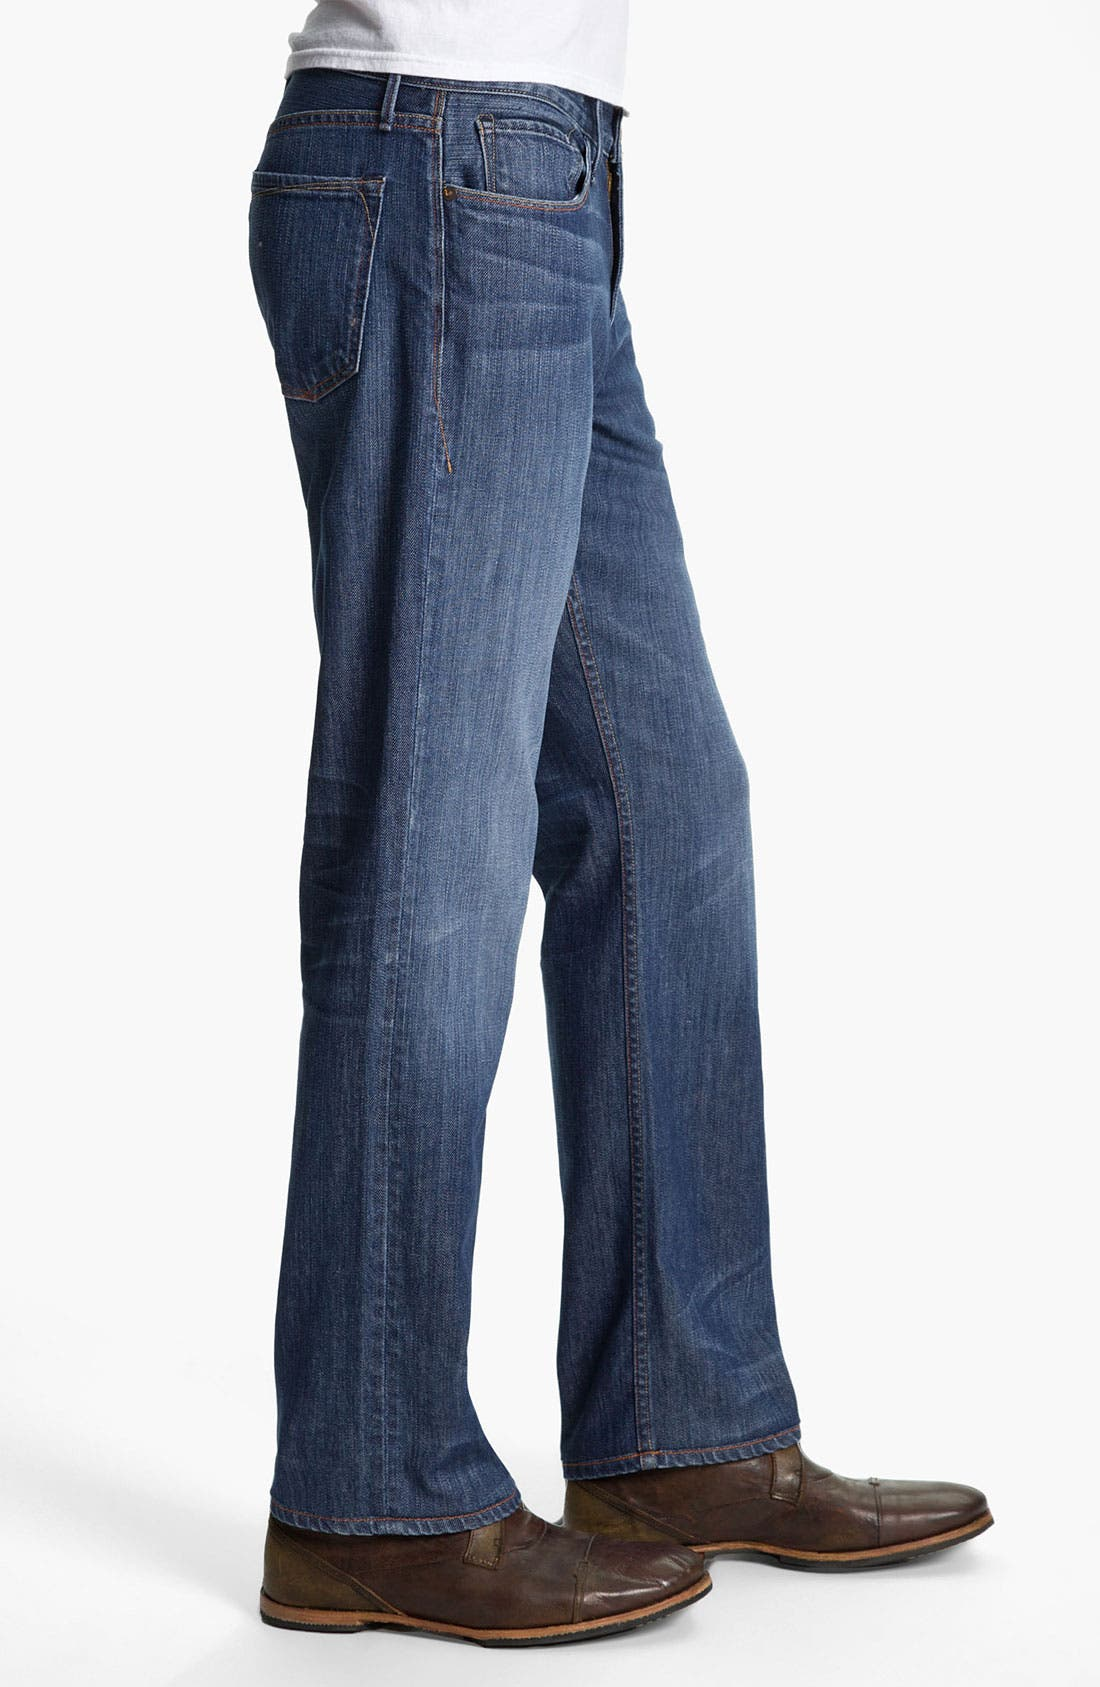 Alternate Image 3  - Earnest Sewn 'Dexter' Relaxed Leg Jeans (Burton)